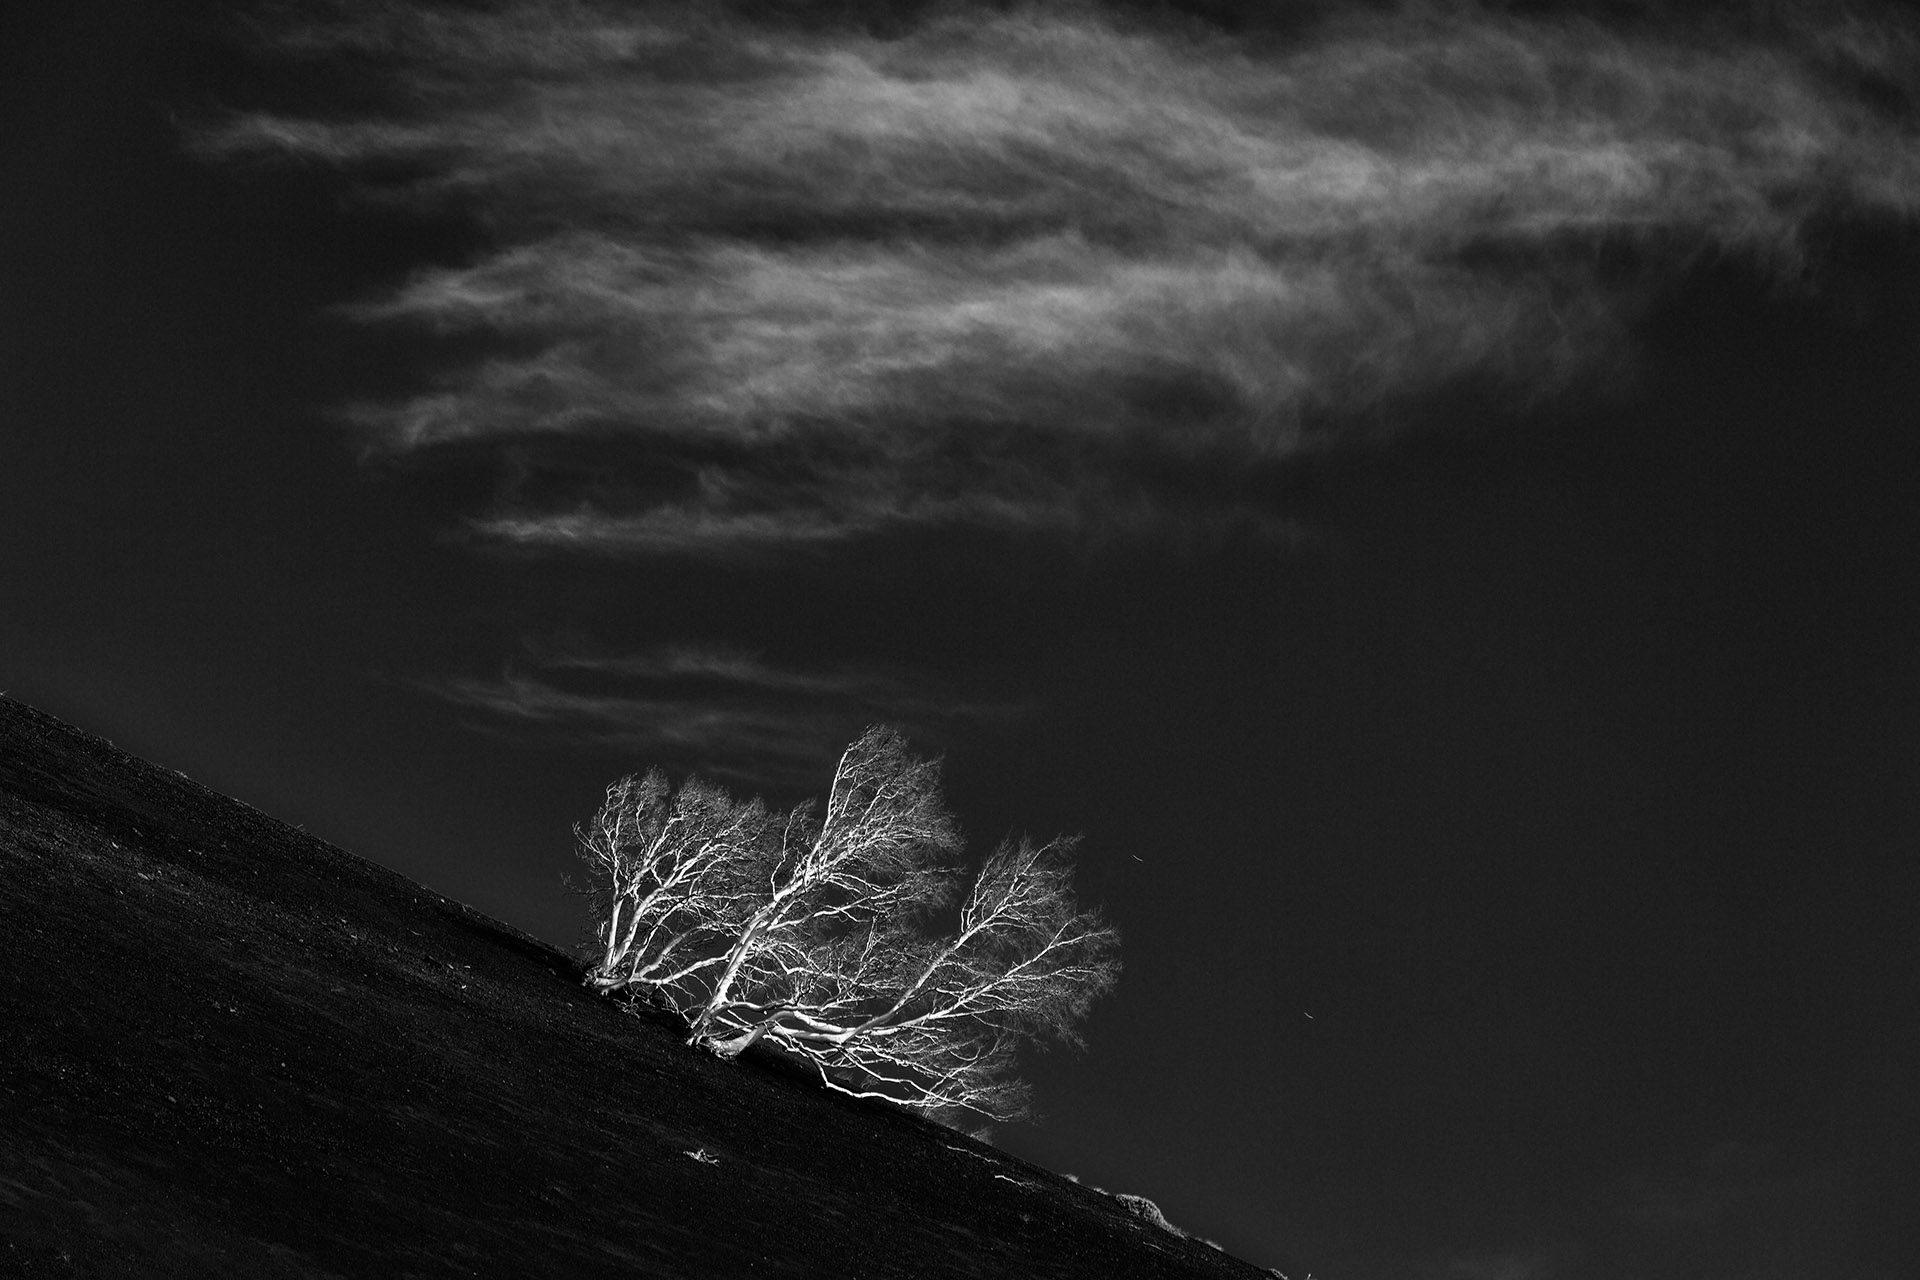 Black & White Photo Project